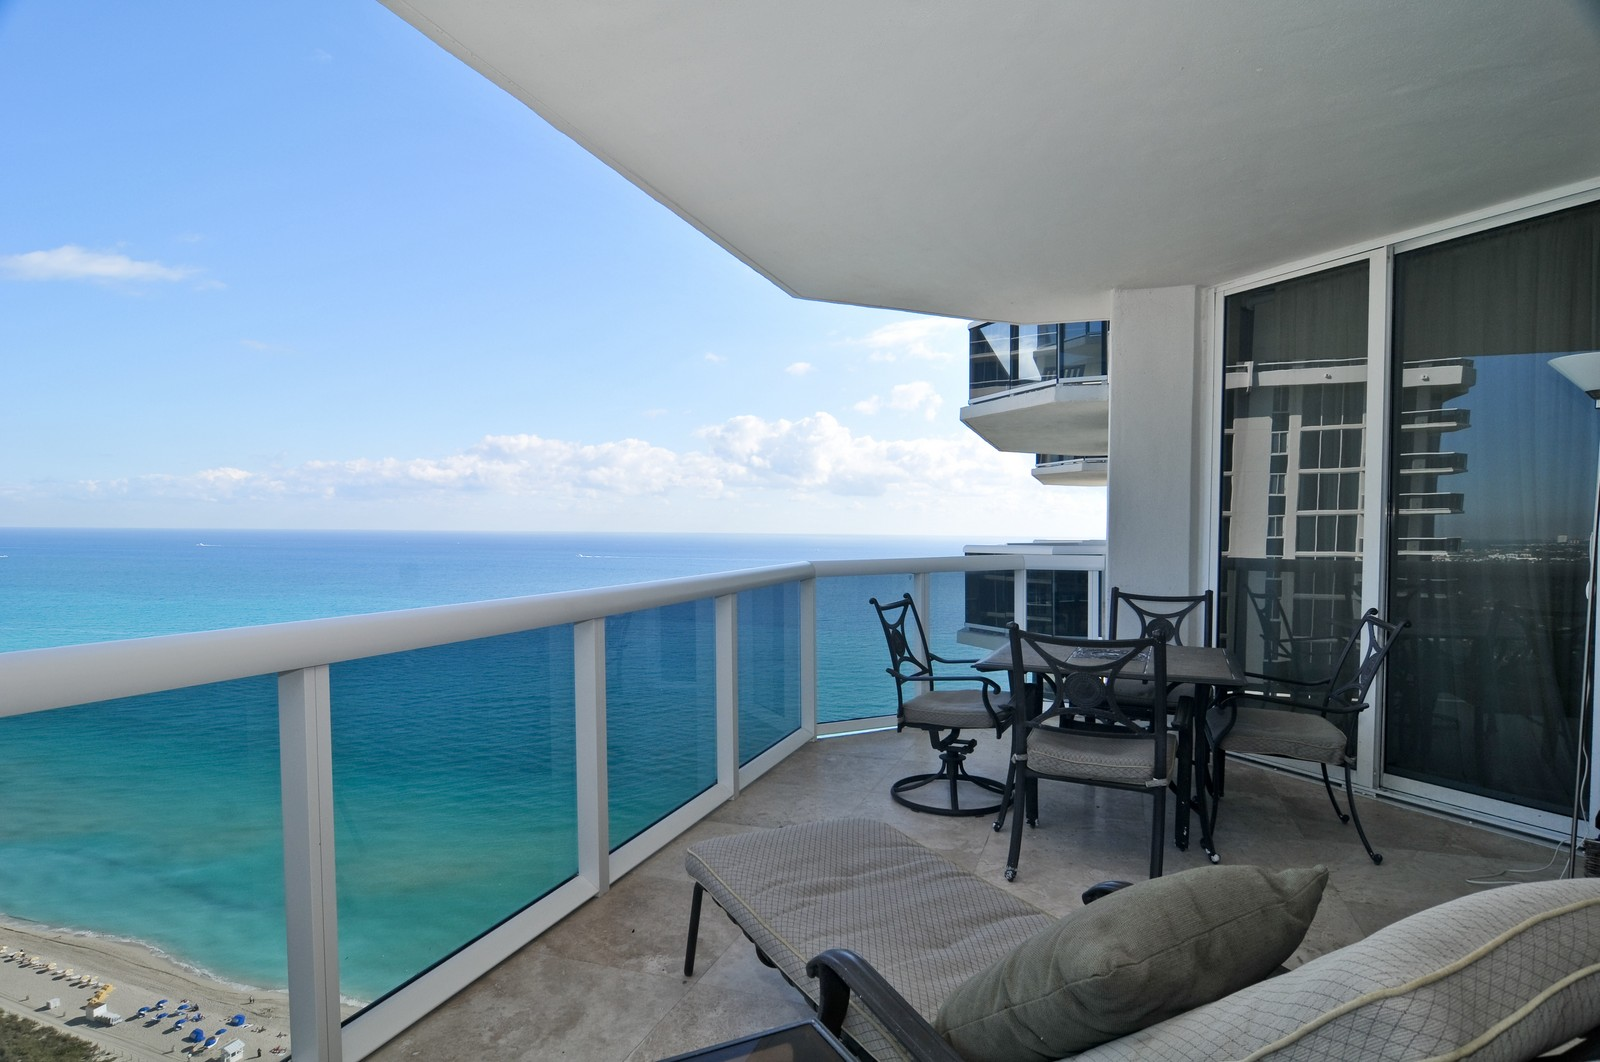 Real Estate Photography - 4775 Collins Ave, Unit 3708, Miami Beach, FL, 33140 - Balcony